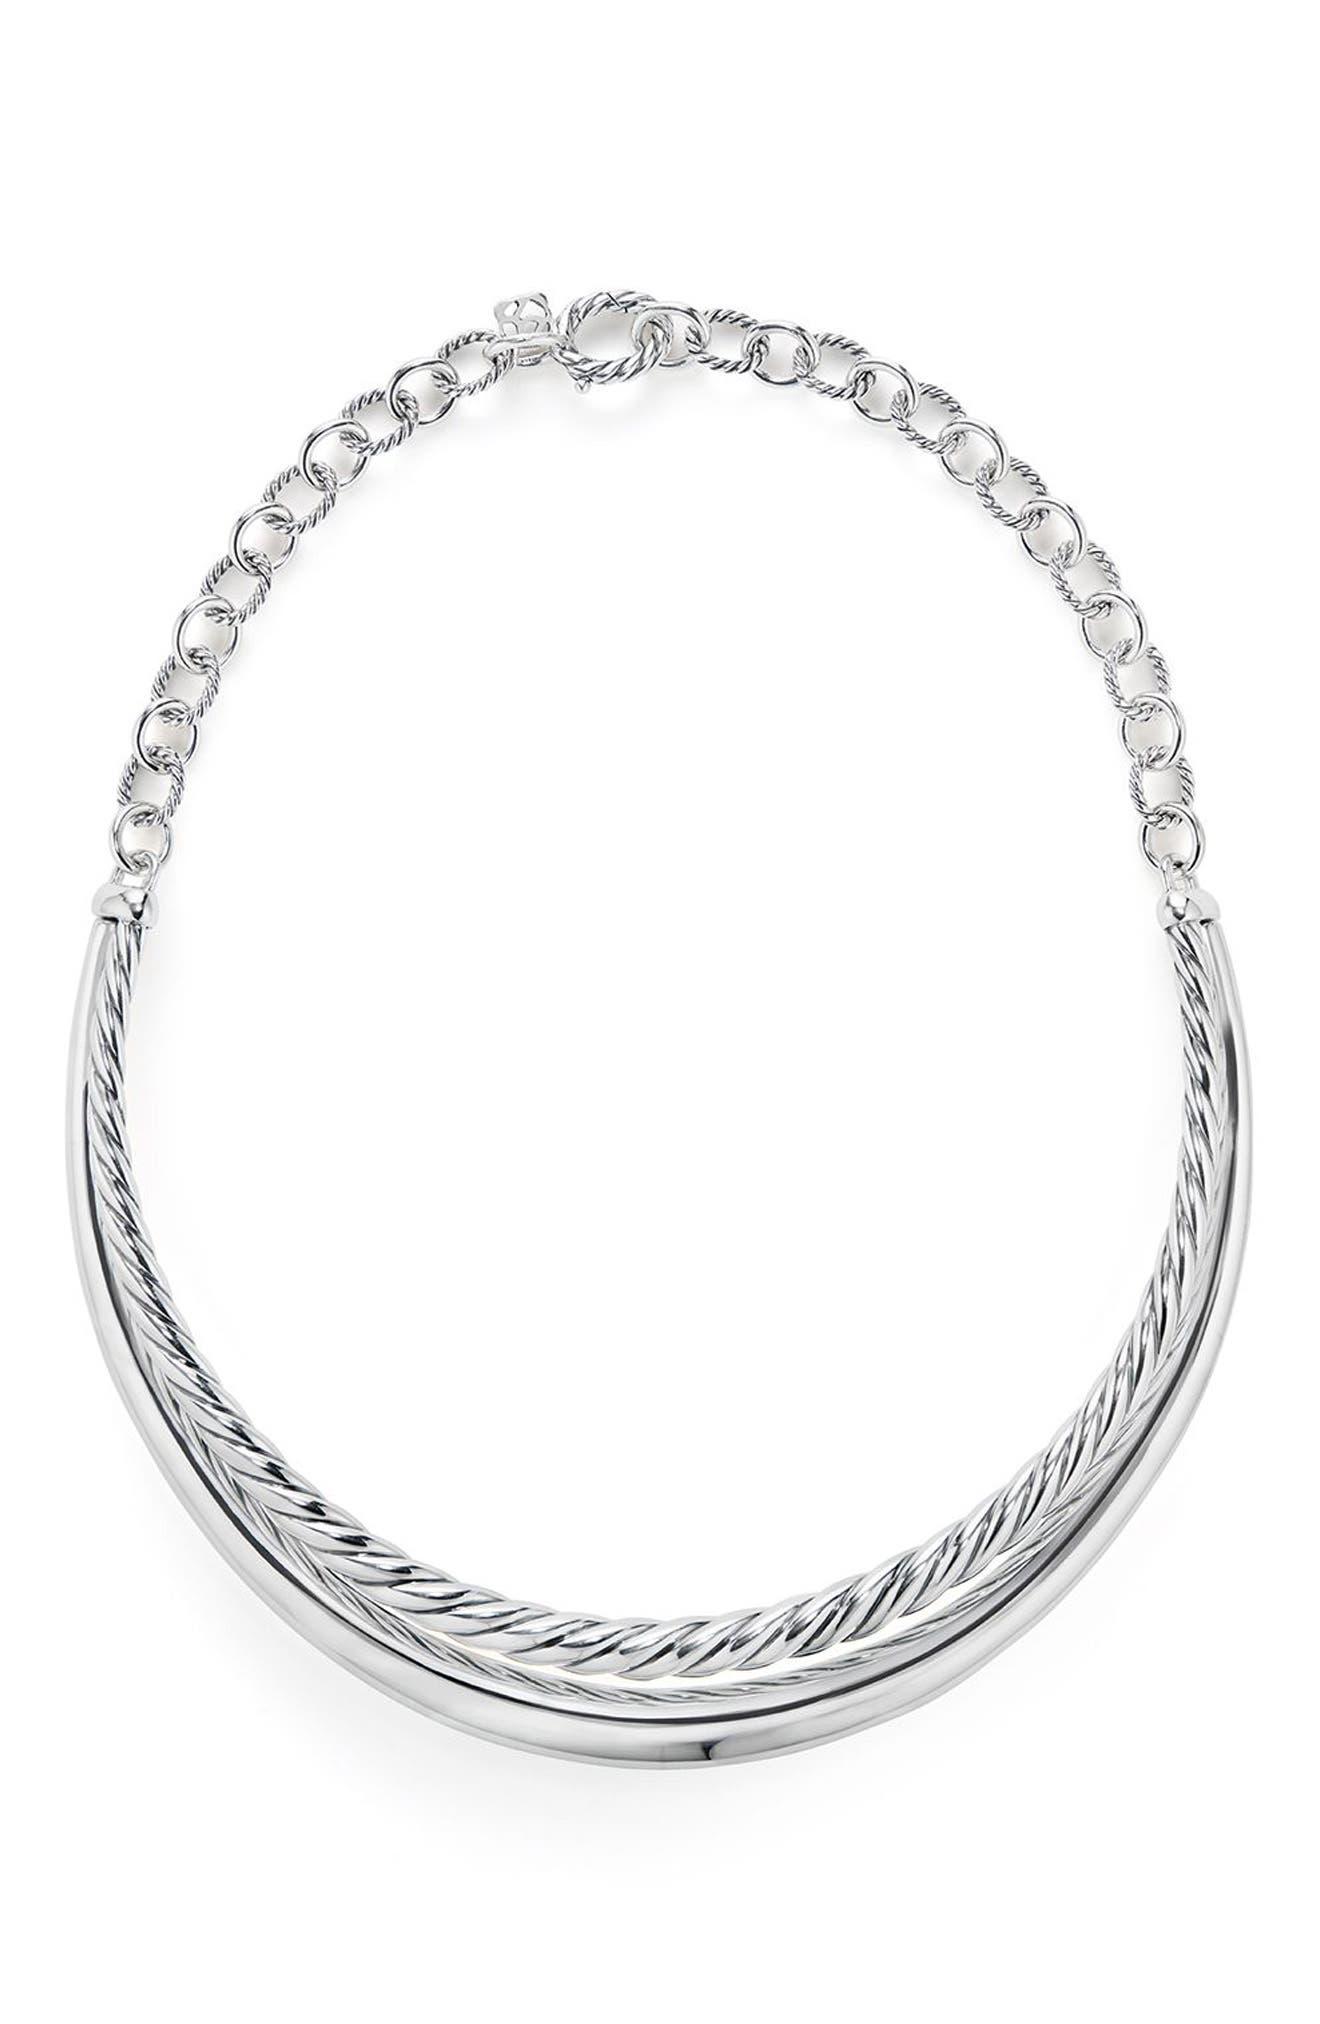 Main Image - David Yurman Pure Form Collar Necklace